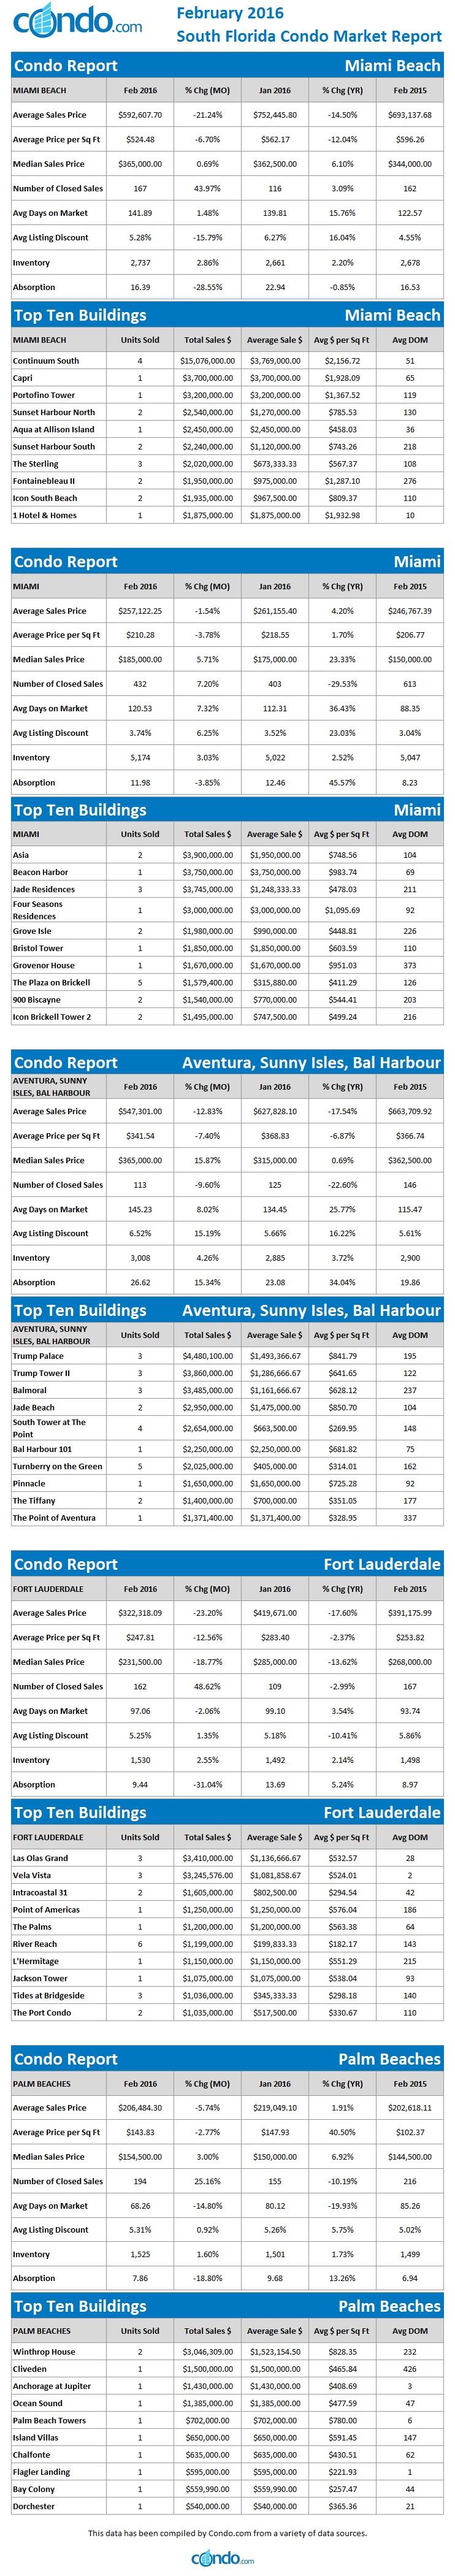 february-2016-market-report